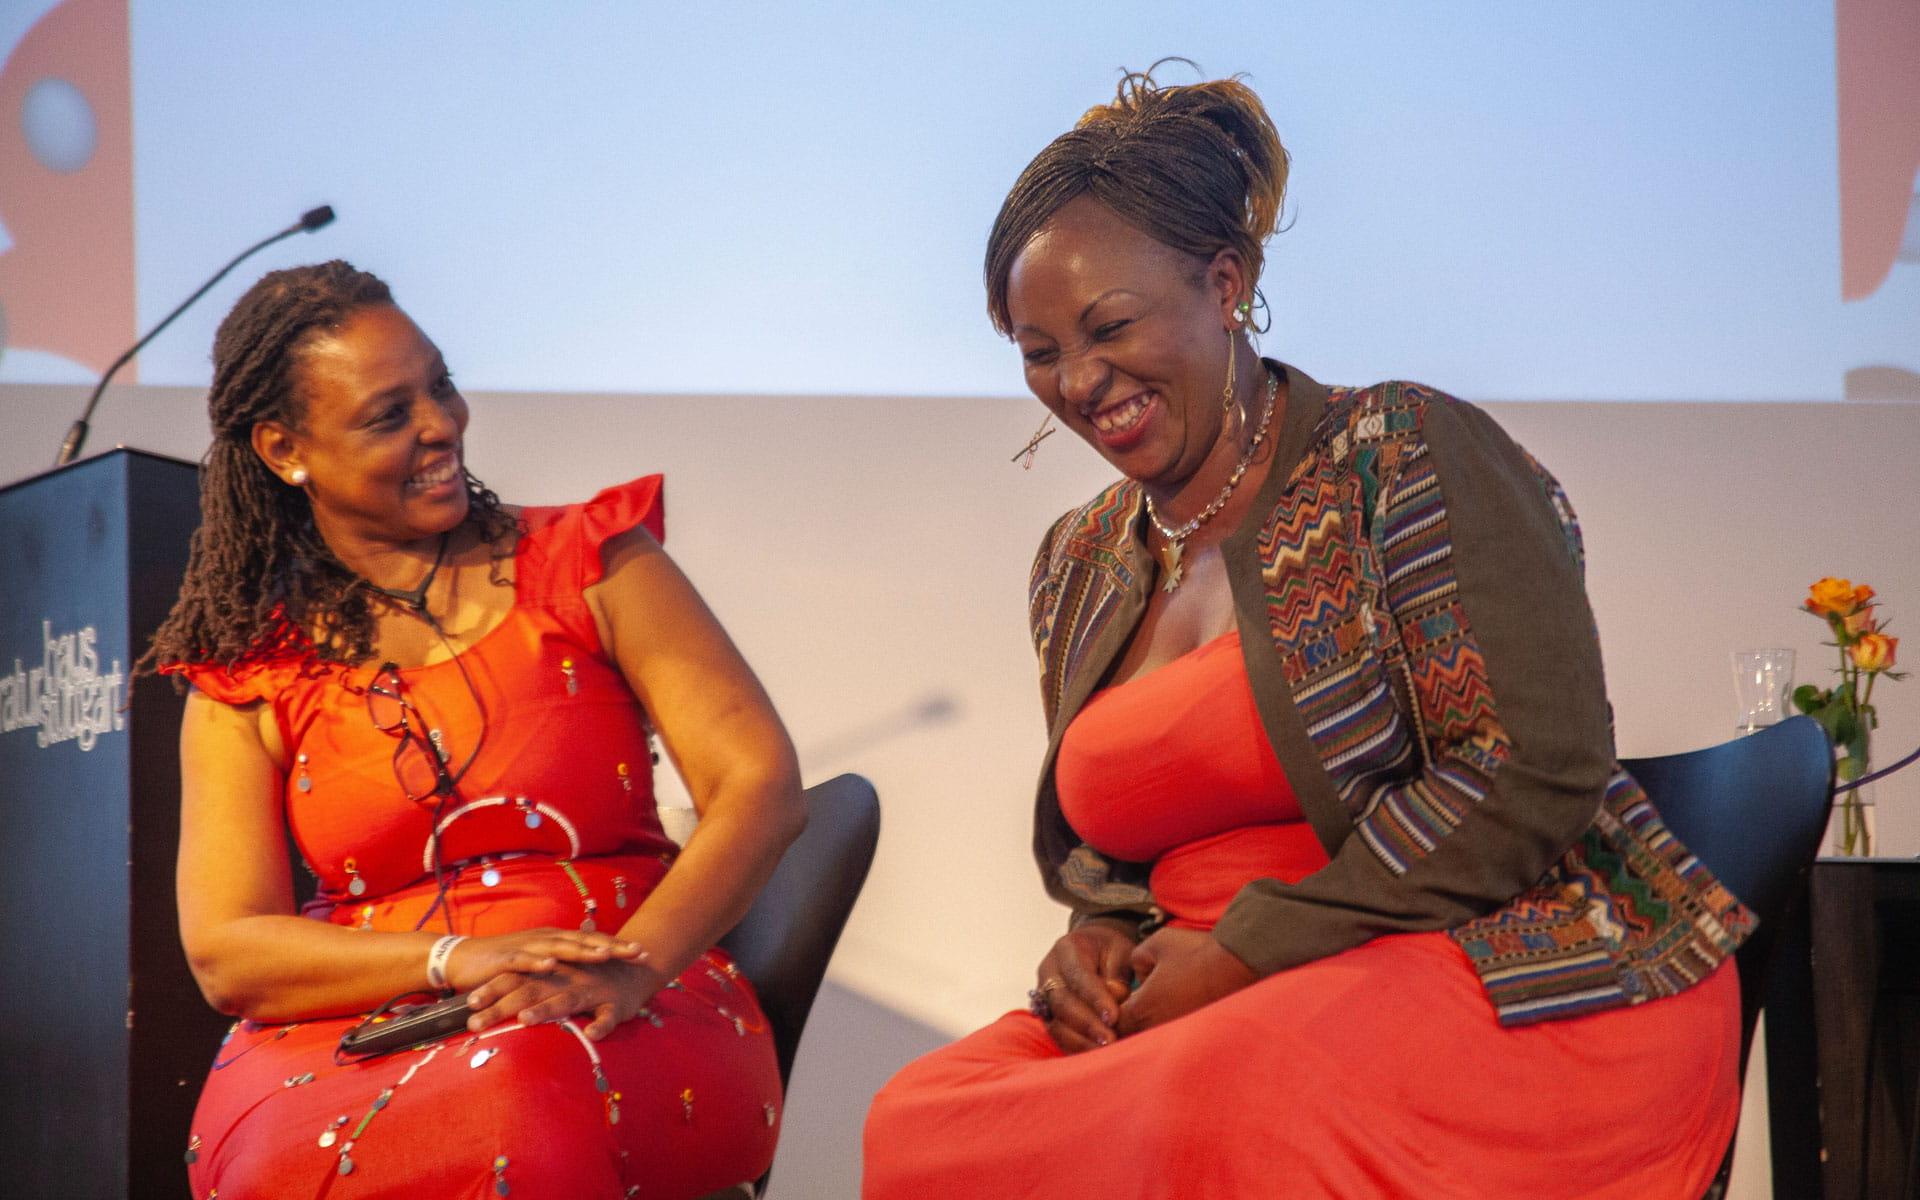 Sheila Ochugboju: Erzählungen vom Festival <br/>(c) Lemia Bodden